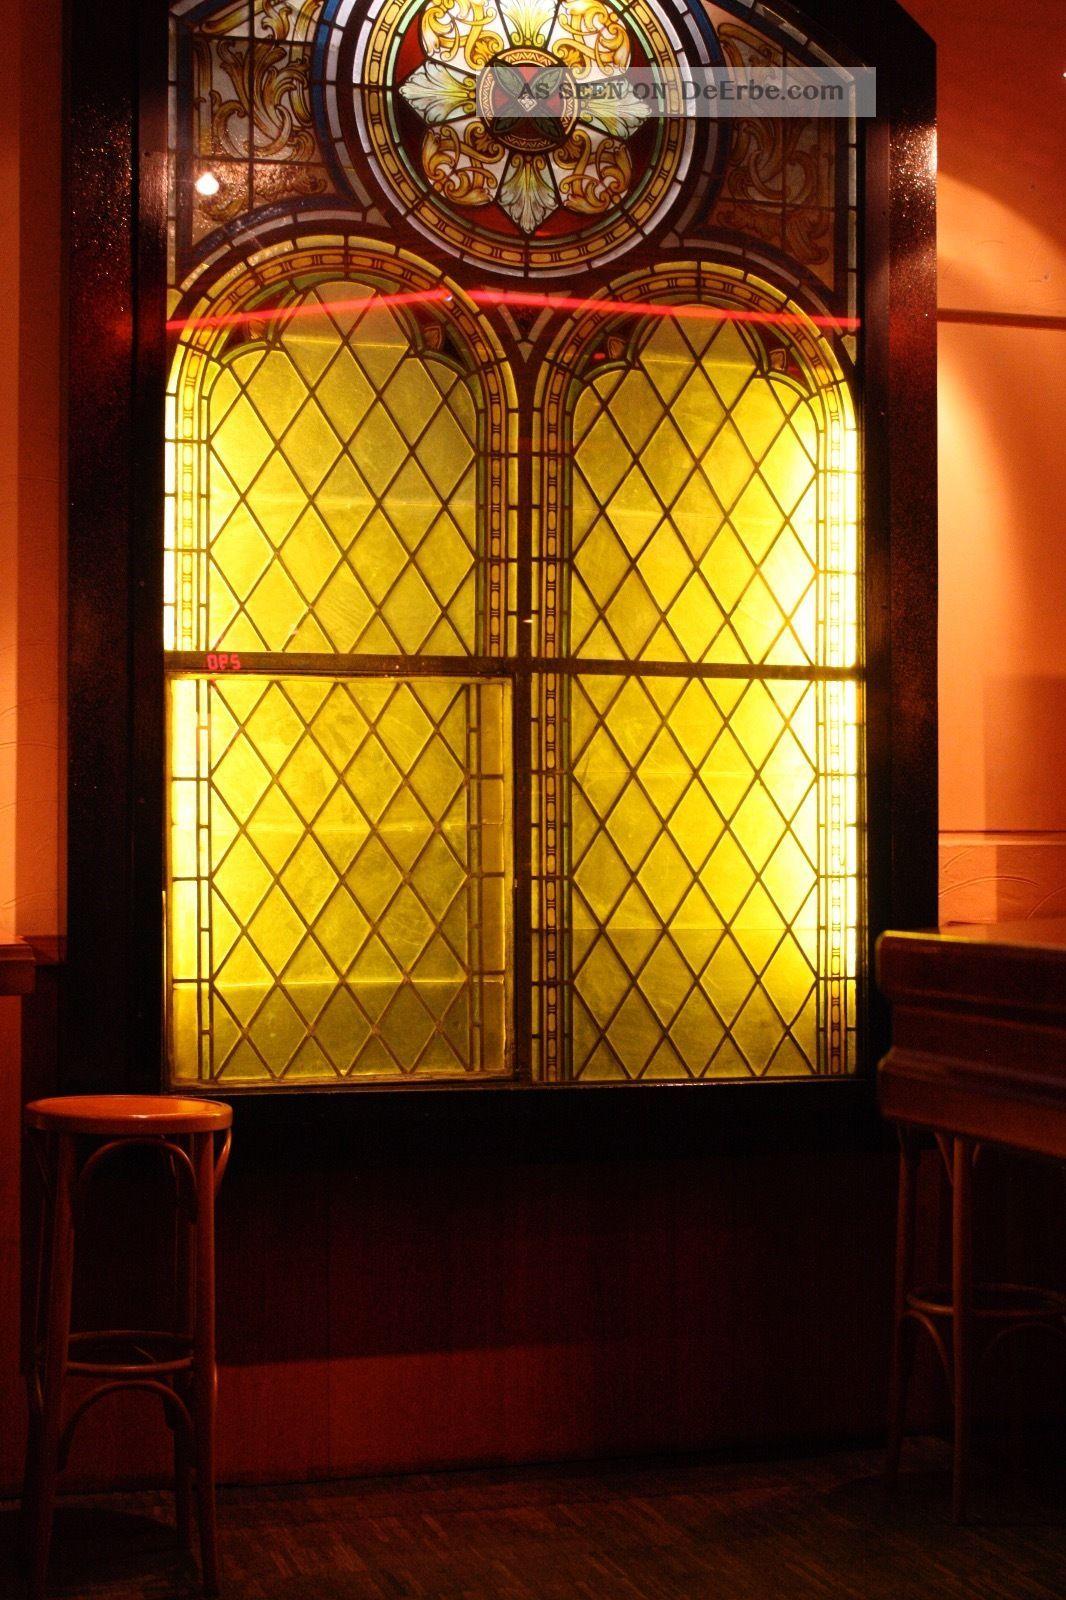 Kirchenfenster,  Bleiverglasung,  Fenster,  Bild,  Glasfenster,  Glasmalerei,  Tiffany Glas & Kristall Bild